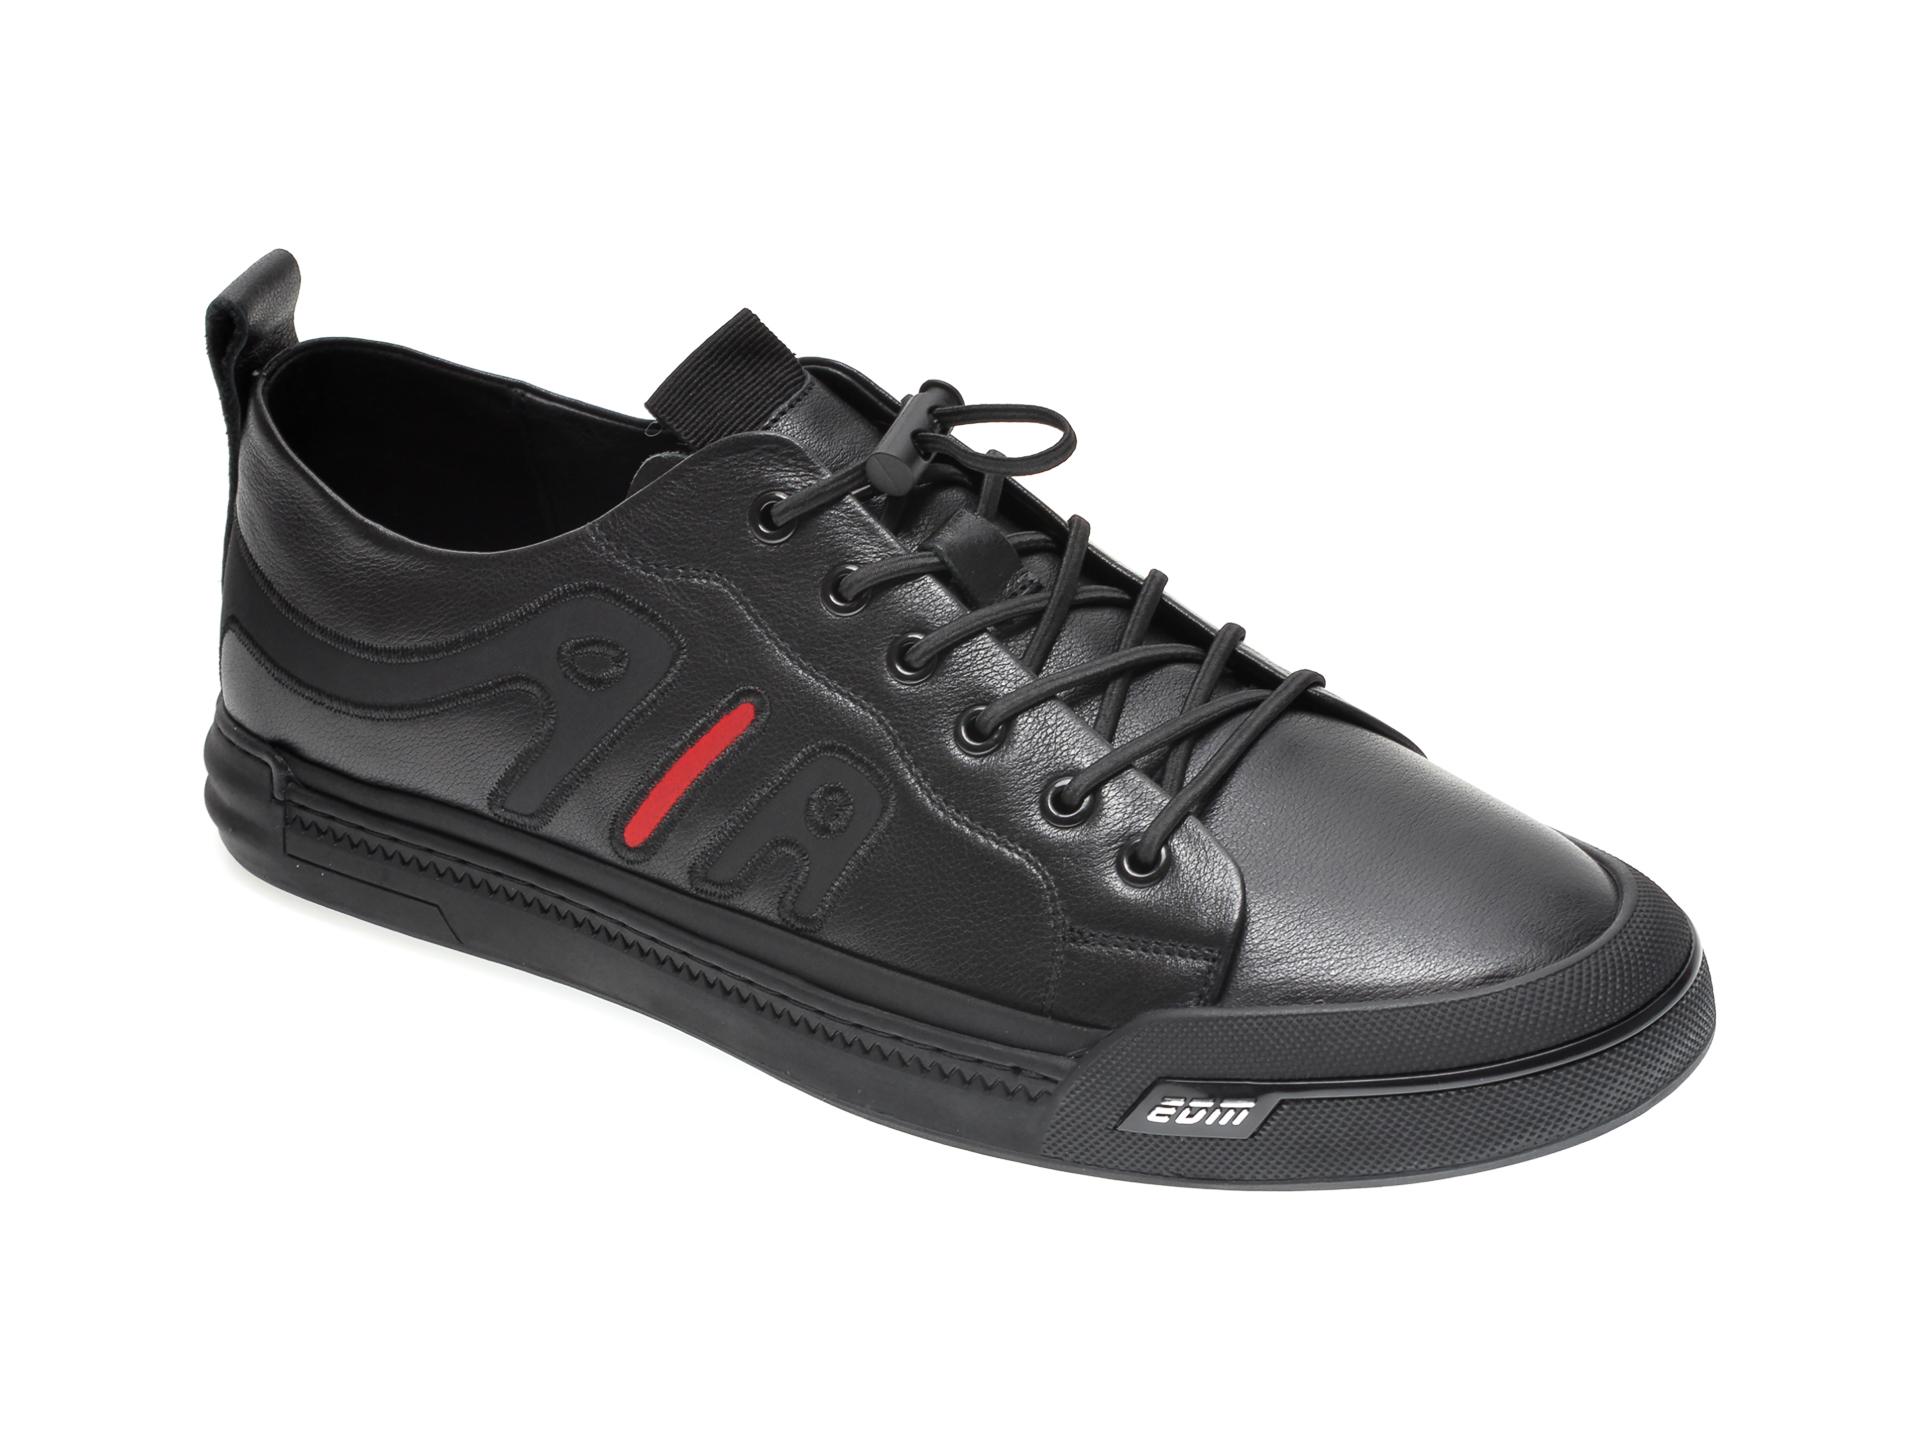 Pantofi Gryxx Negri, A02672, Din Piele Naturala